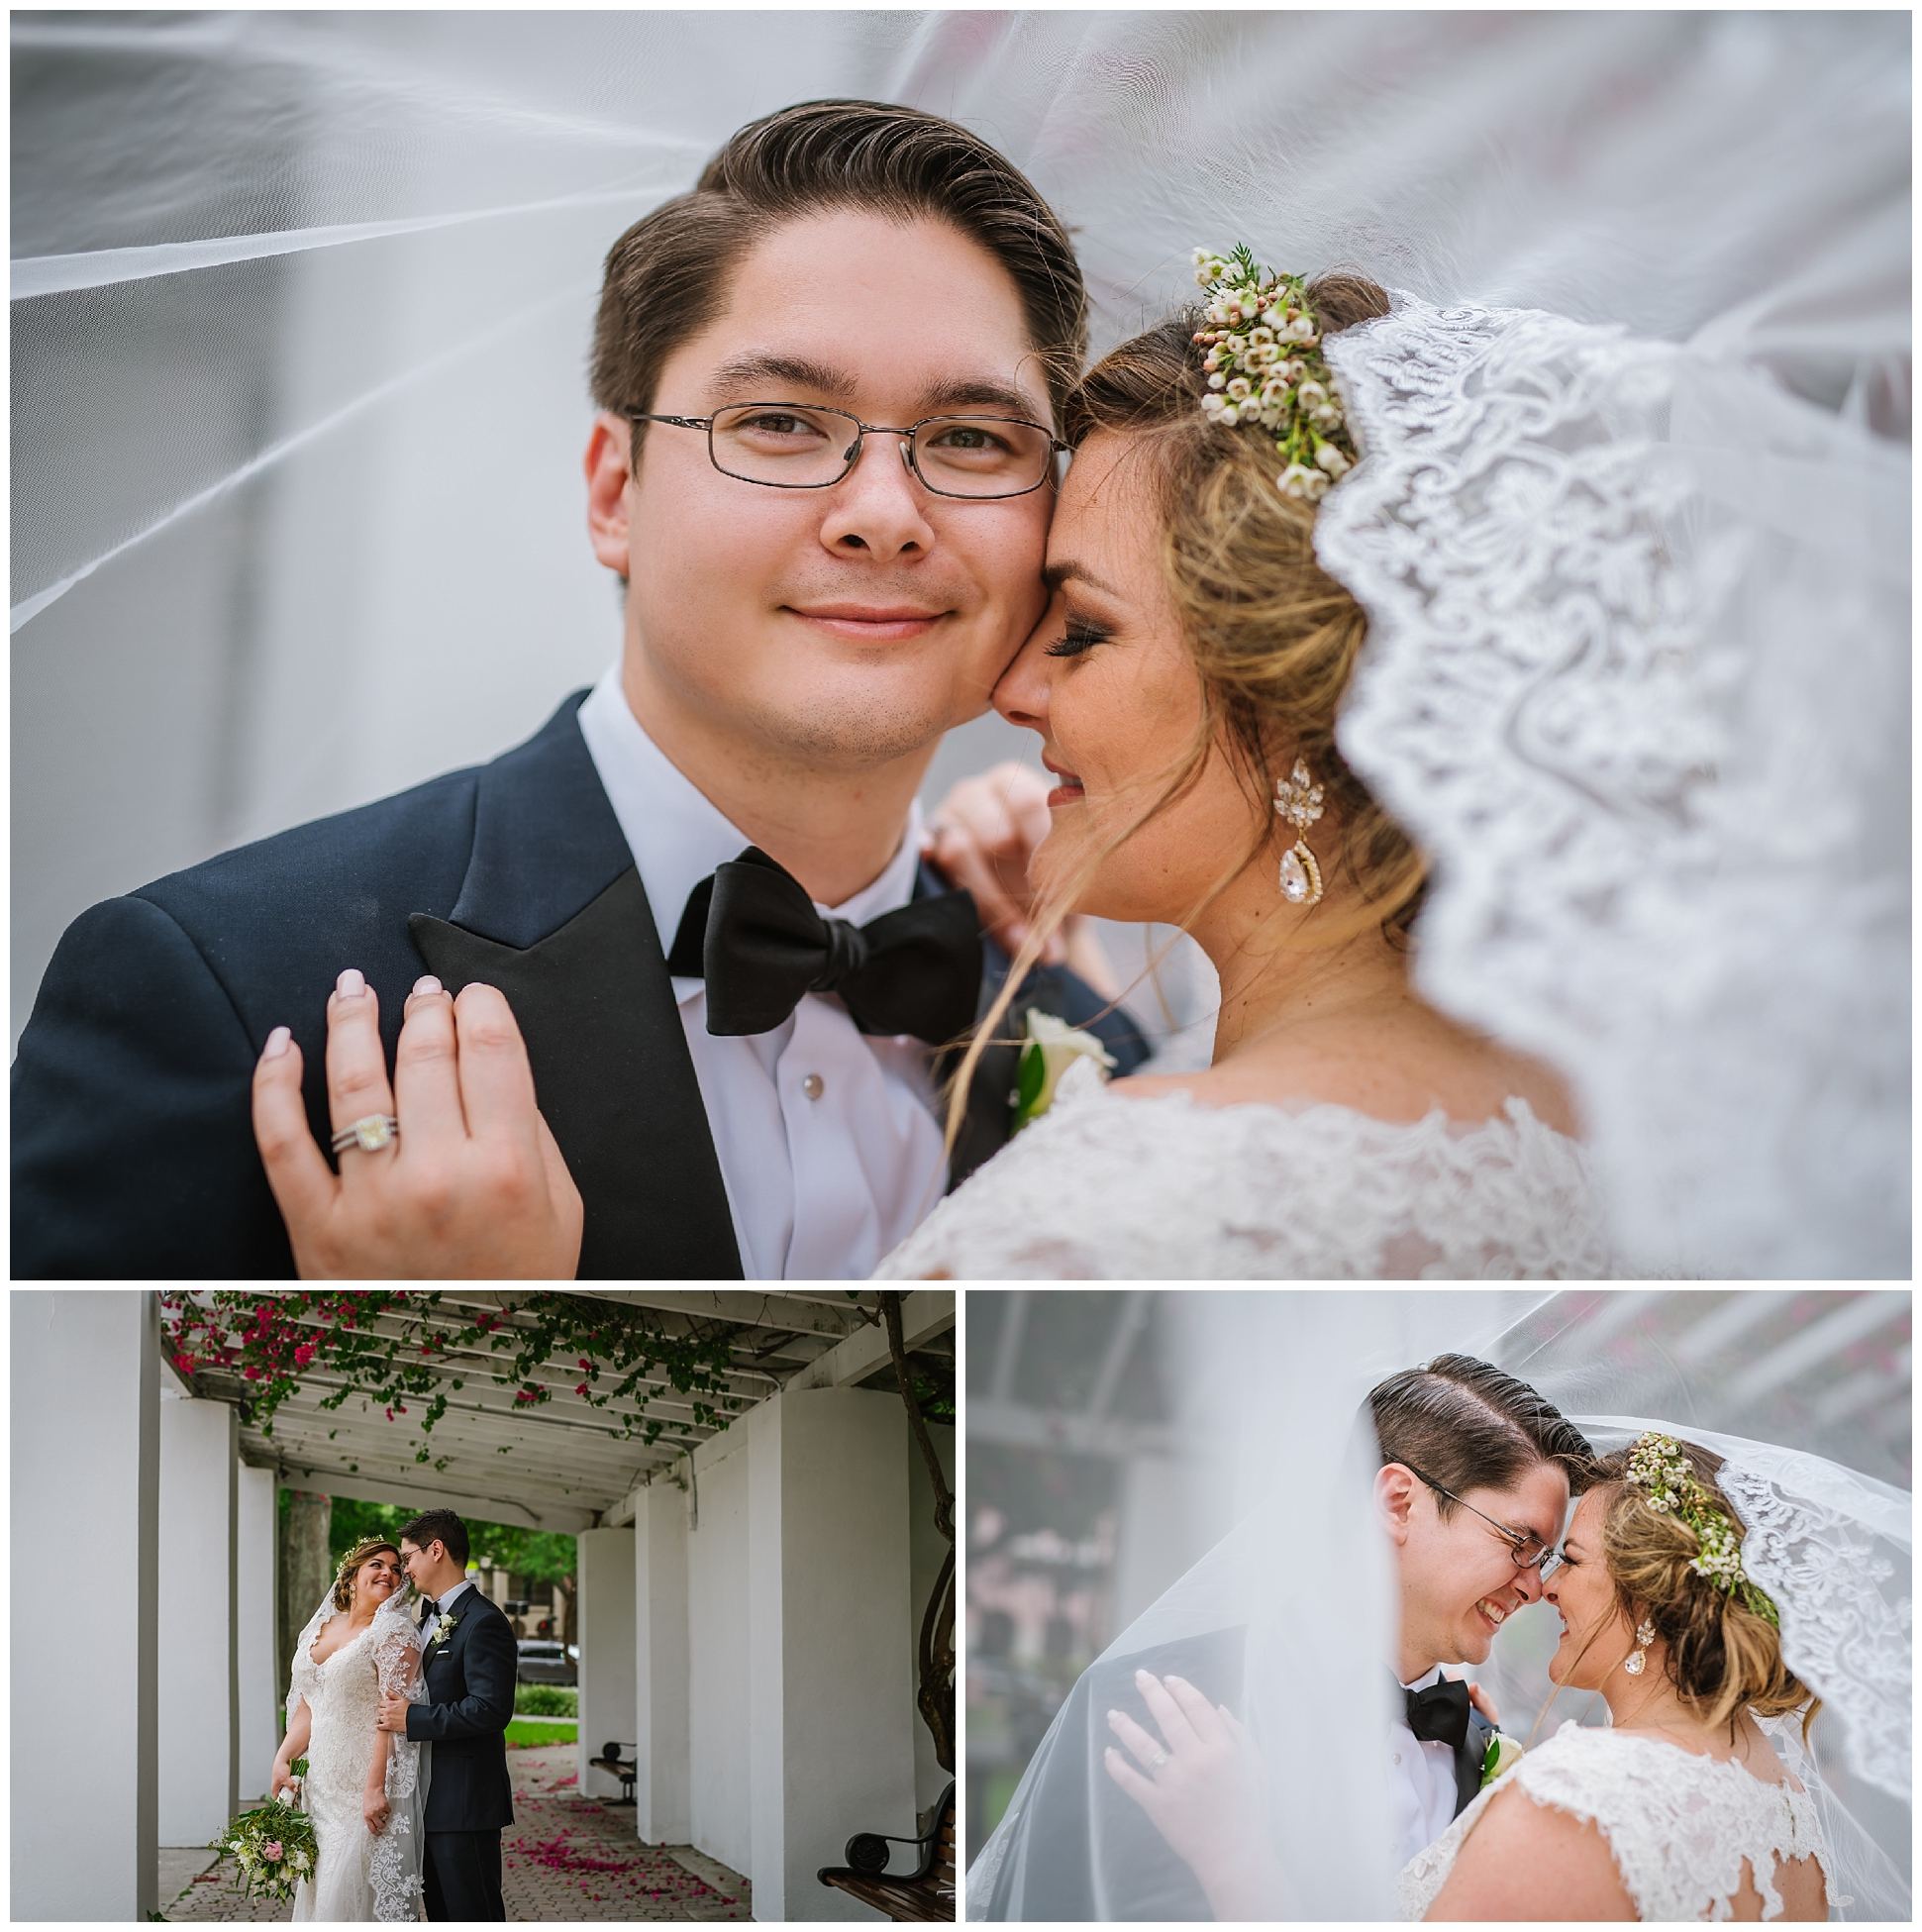 st-pete-wedding-photographer-italian-romance-theme-rustic-flower-crown_0418.jpg